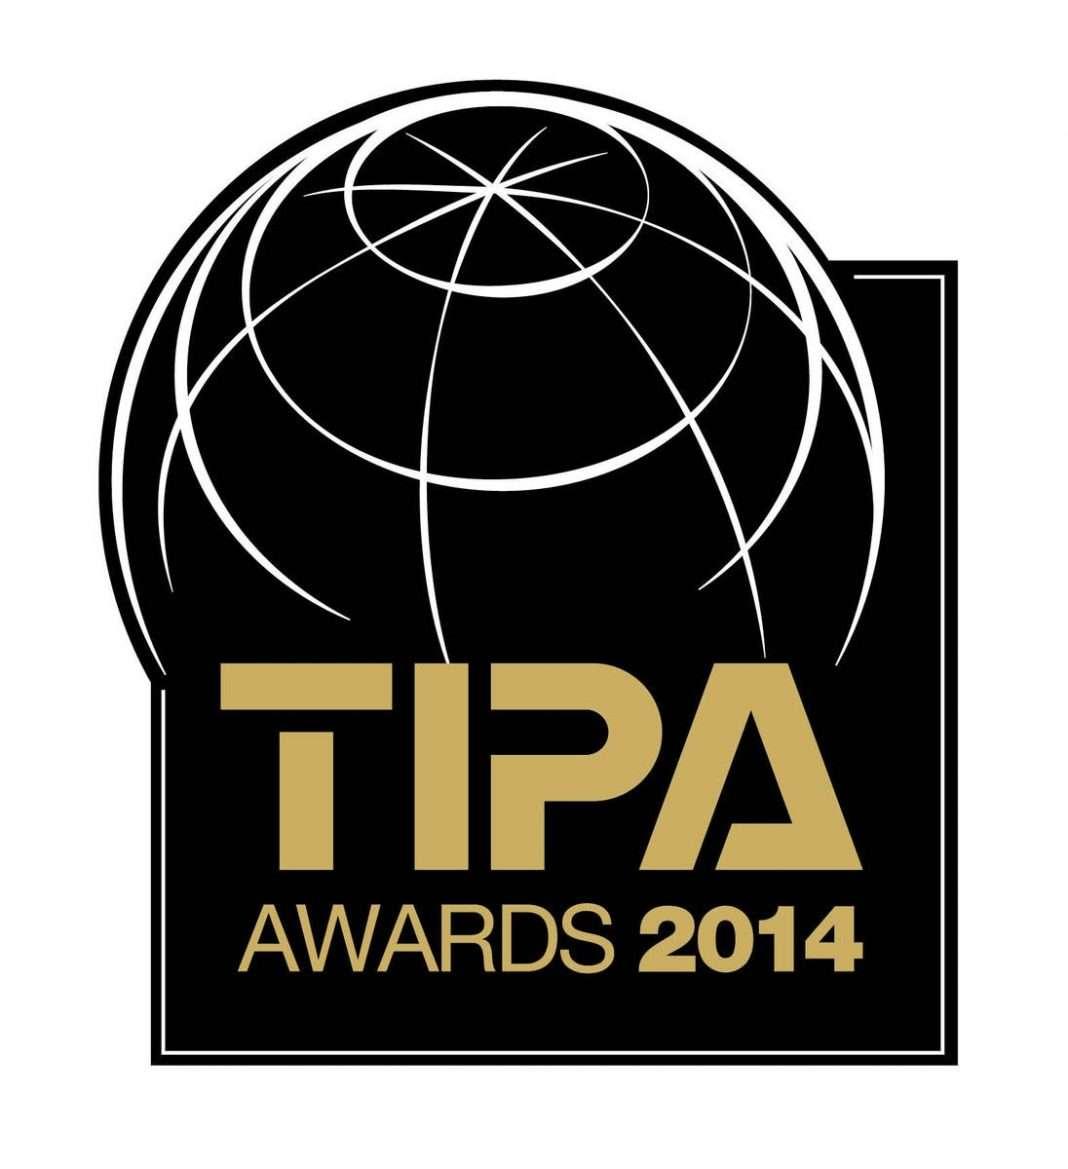 tipa_awards_2014_logo_300.jpg